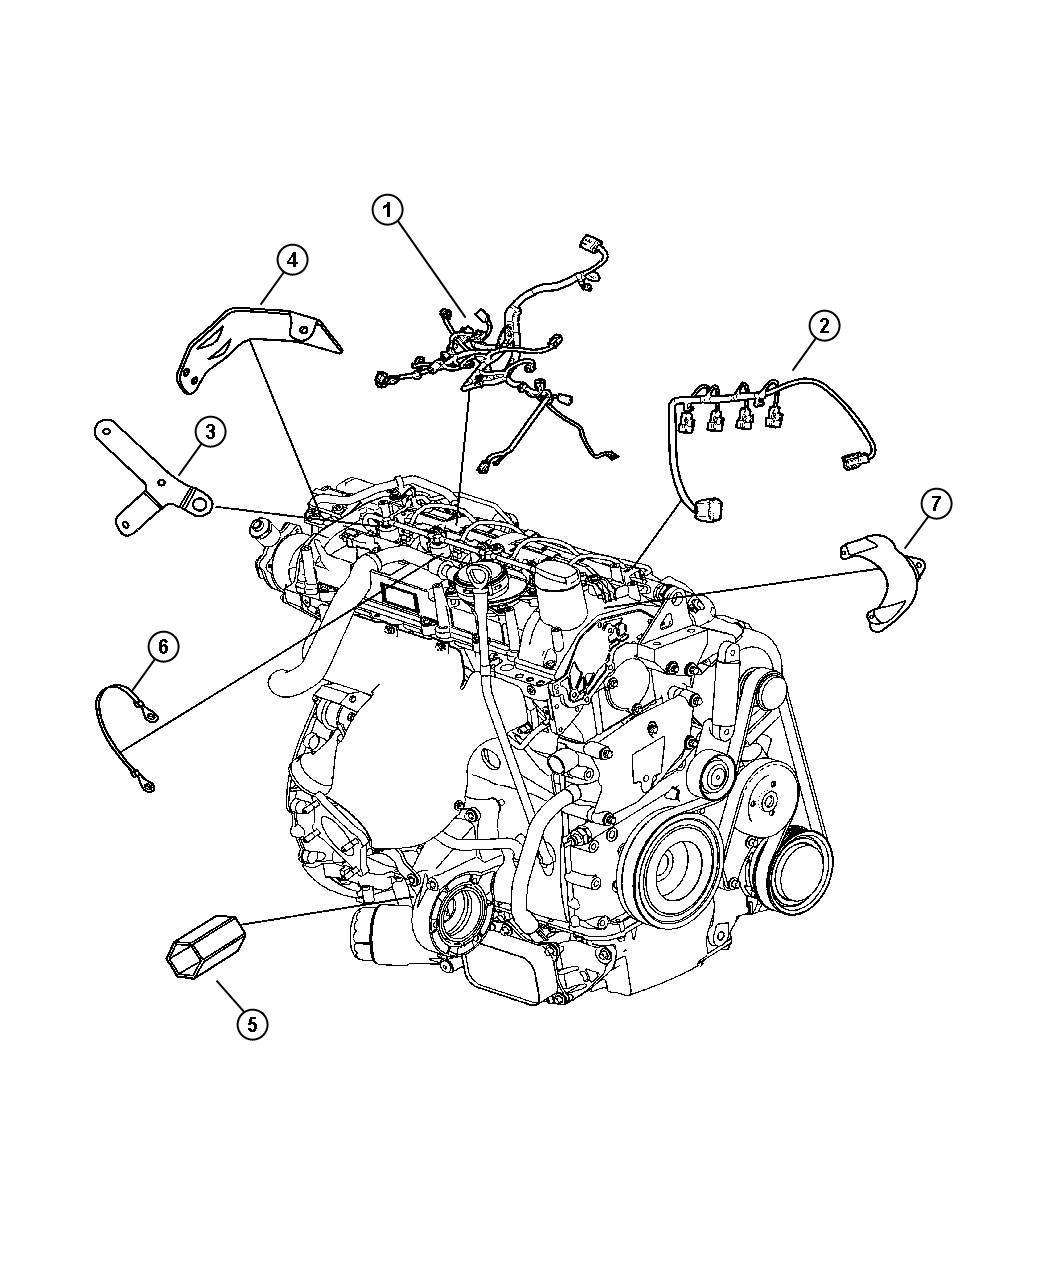 2008 Chrysler Pt Cruiser Wiring. Injector - 04795679AB ...